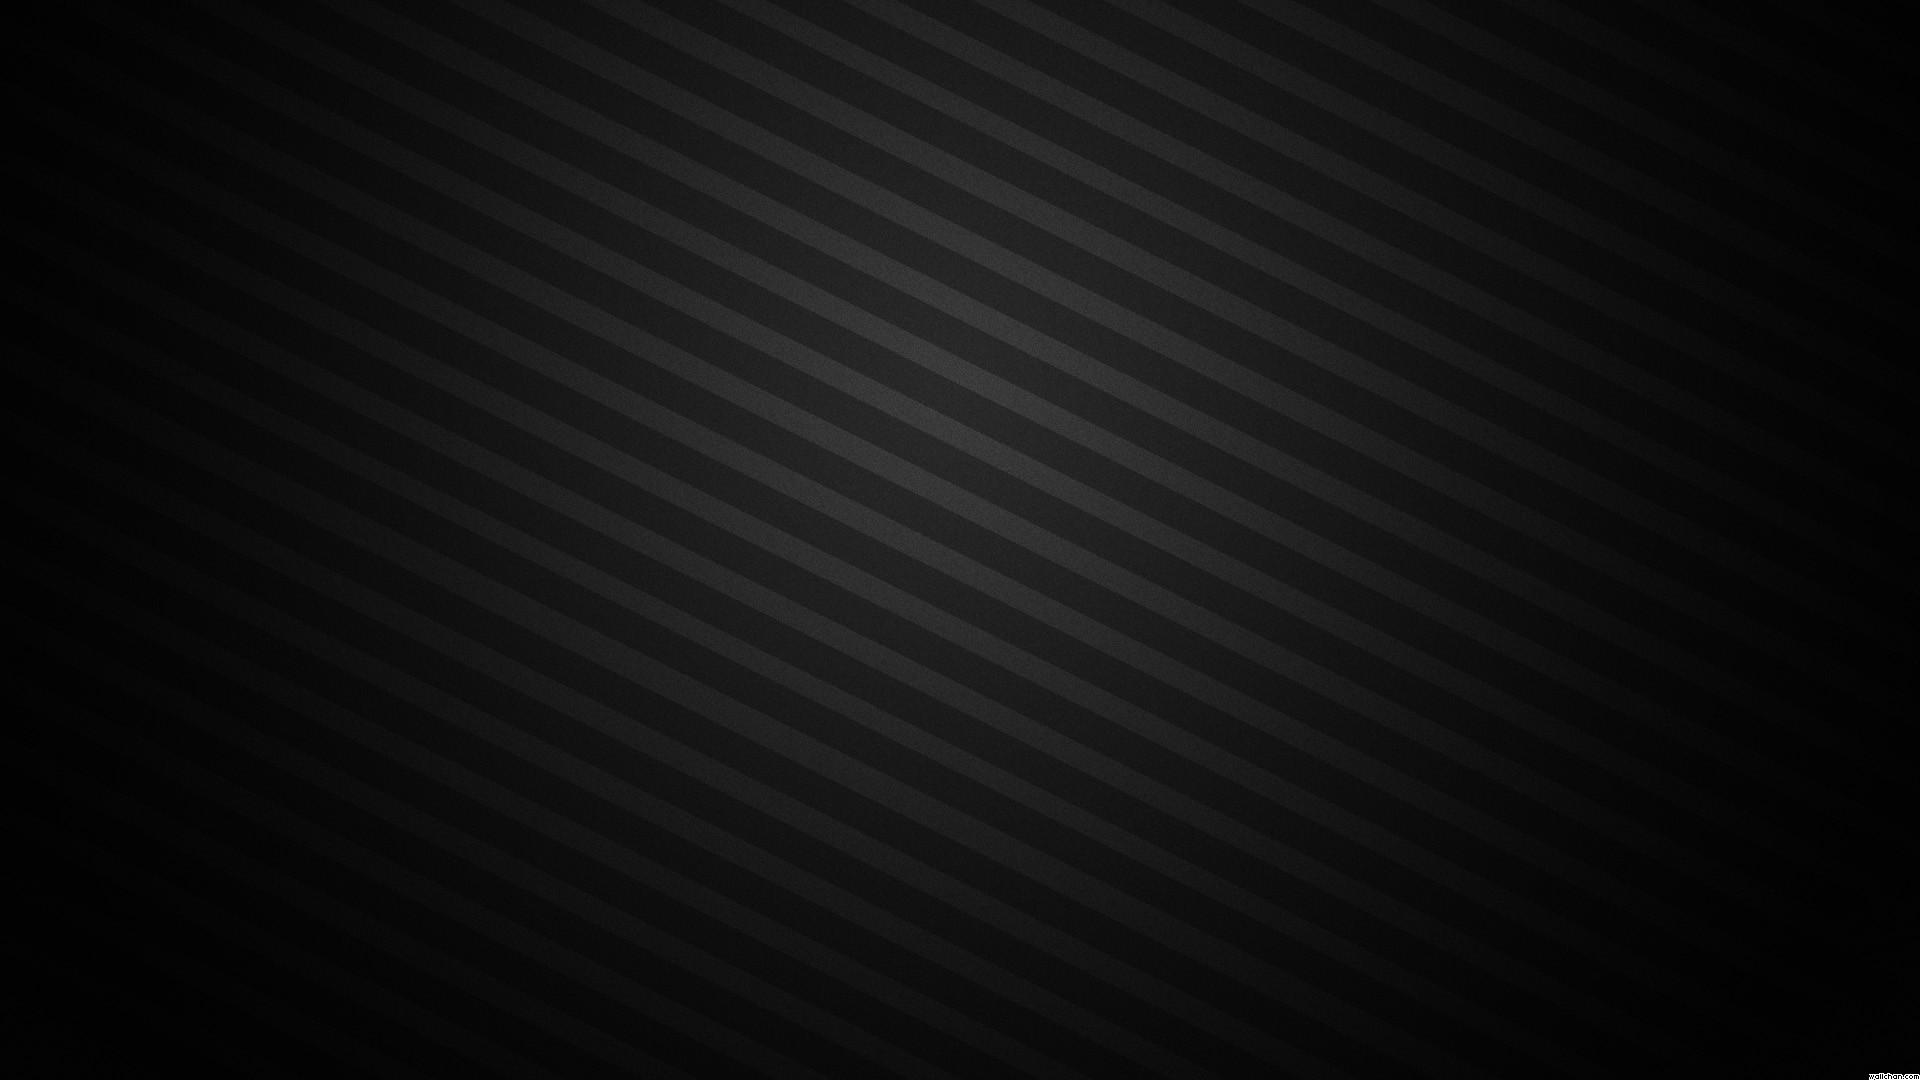 Dark Pattern Wallpaper For Android Et194 Bingo Saint Eustache